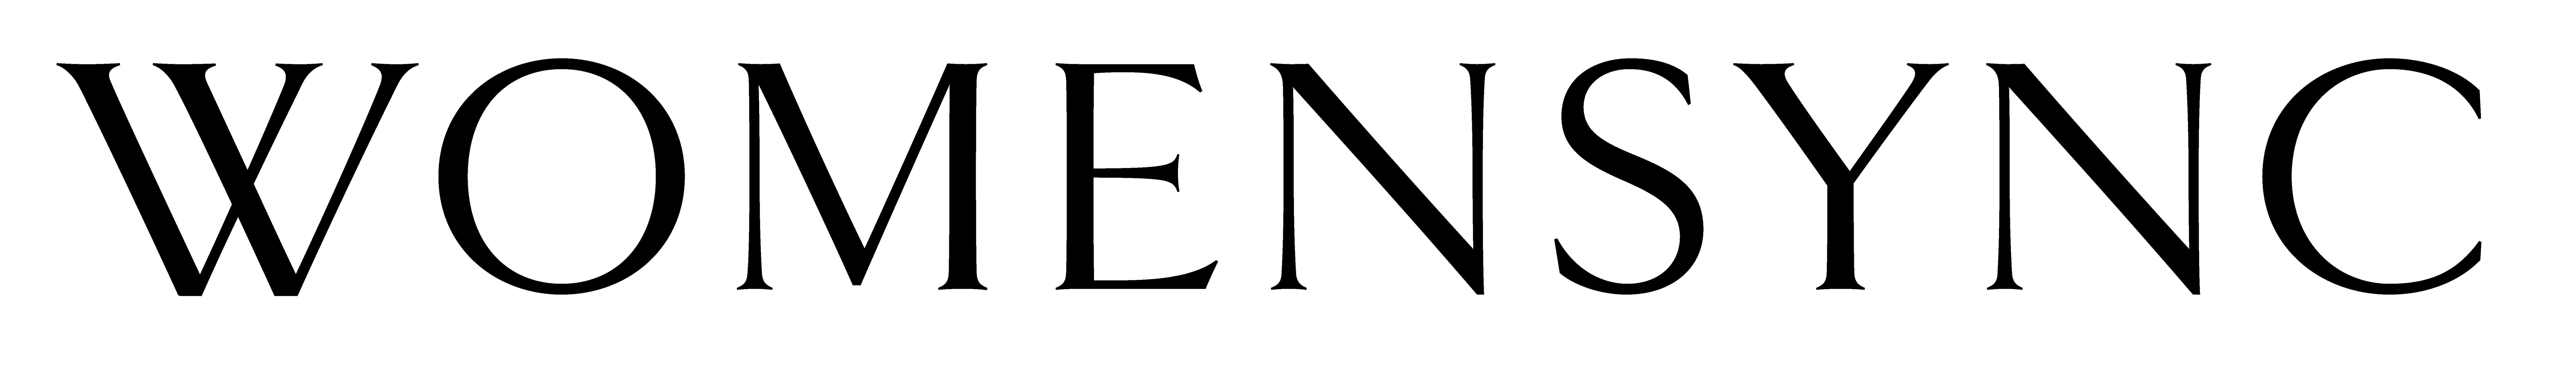 womesync_wordmark_logo_svart